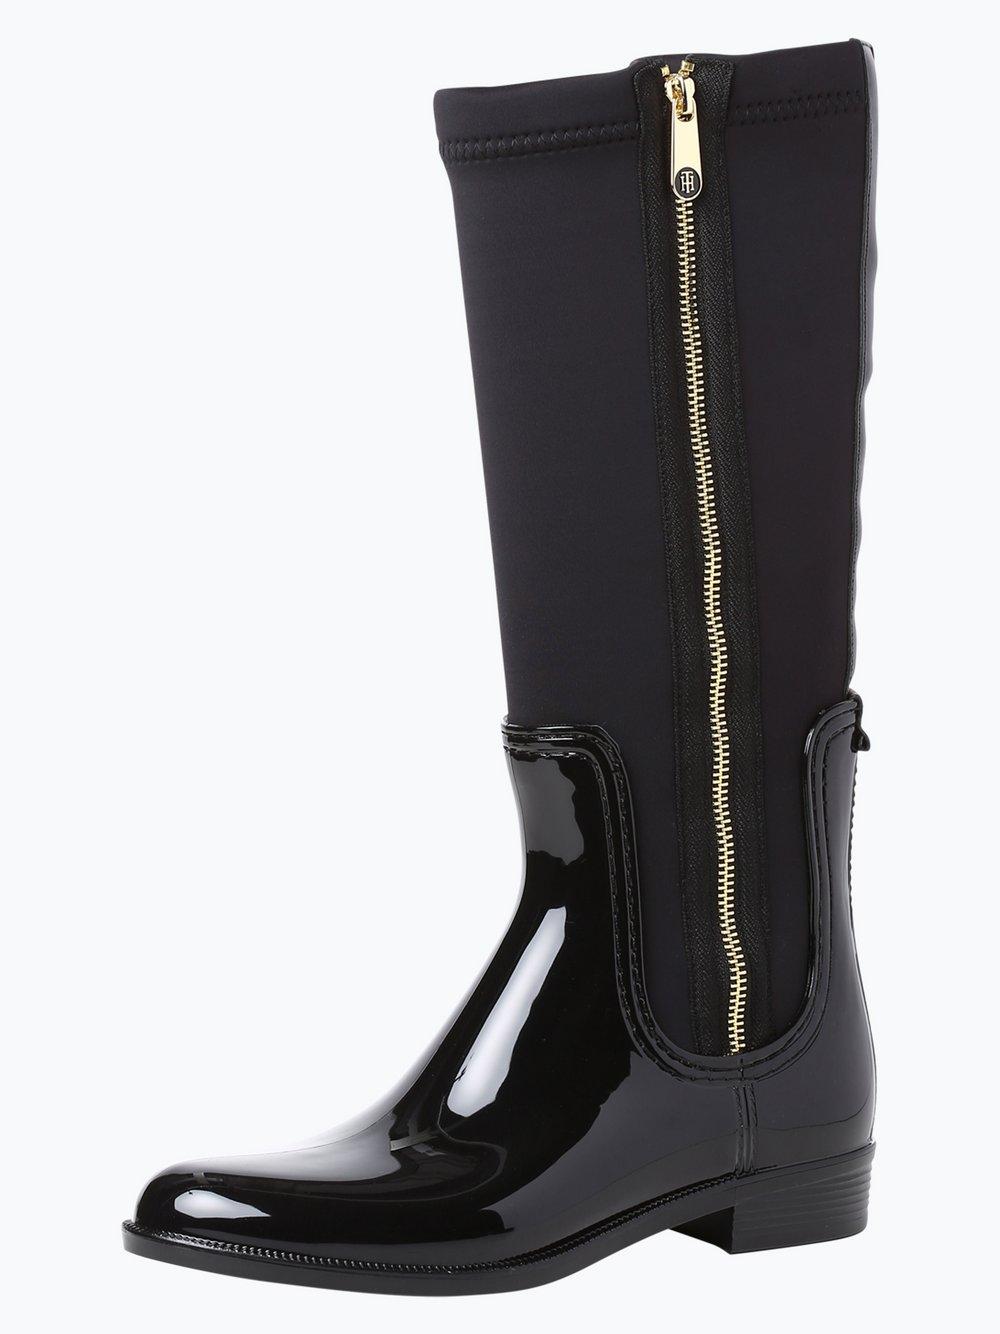 low priced a1472 47dfd Tommy Hilfiger Damen Stiefel - Odette online kaufen | PEEK ...